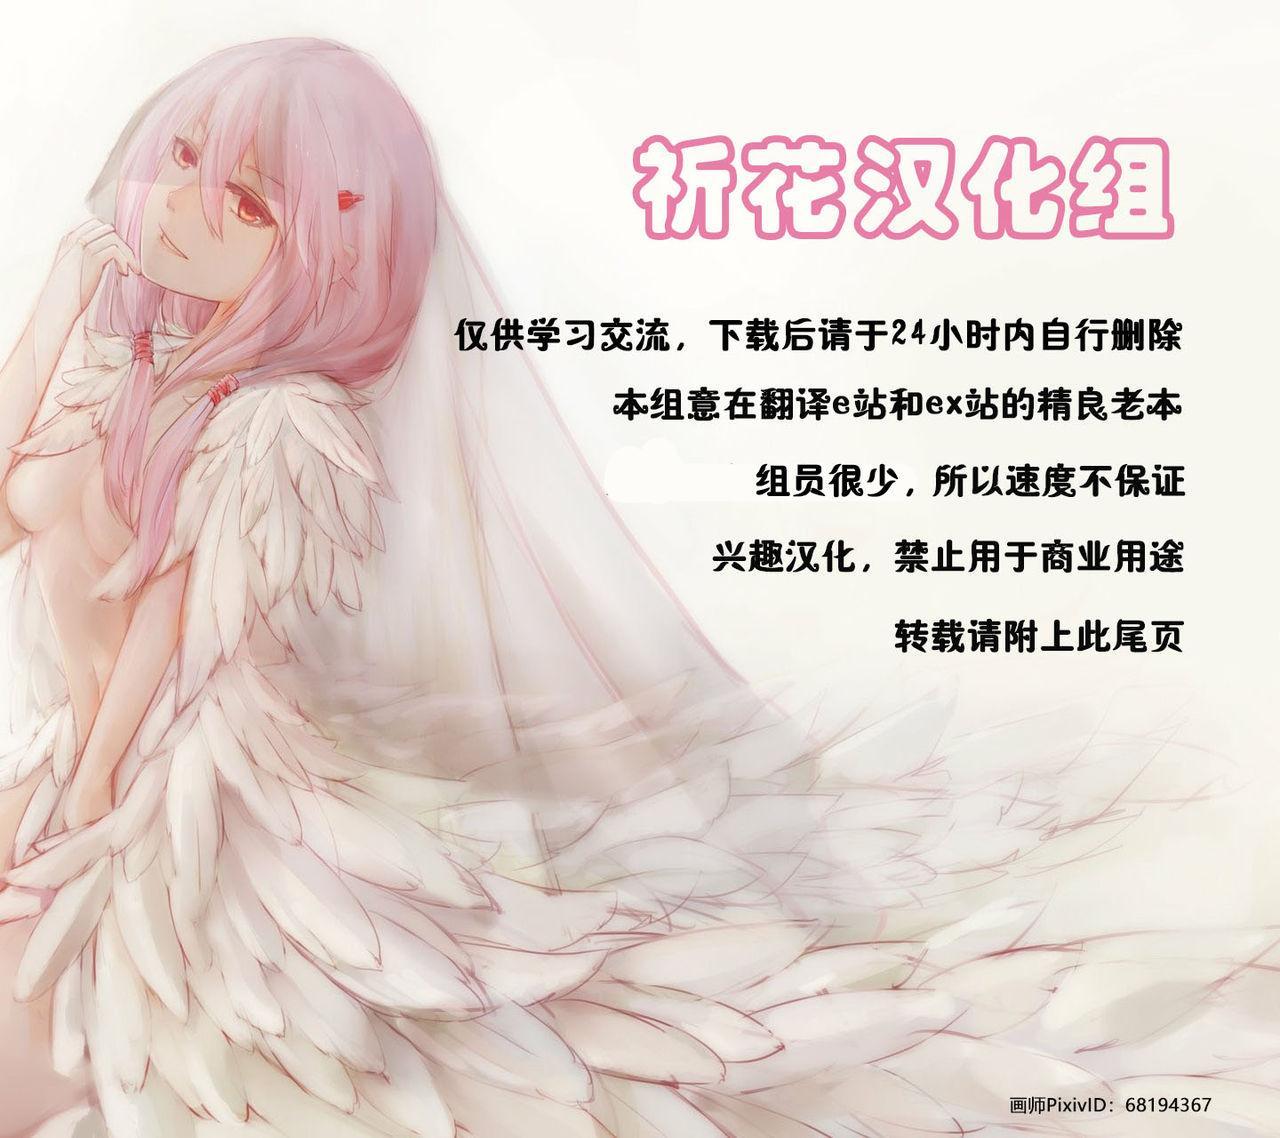 (C91) [Nazunaya Honpo (7zu7)] Alena-san Juu■-sai! (Dragon Quest IV) [Chinese] [祈花汉化组] 23